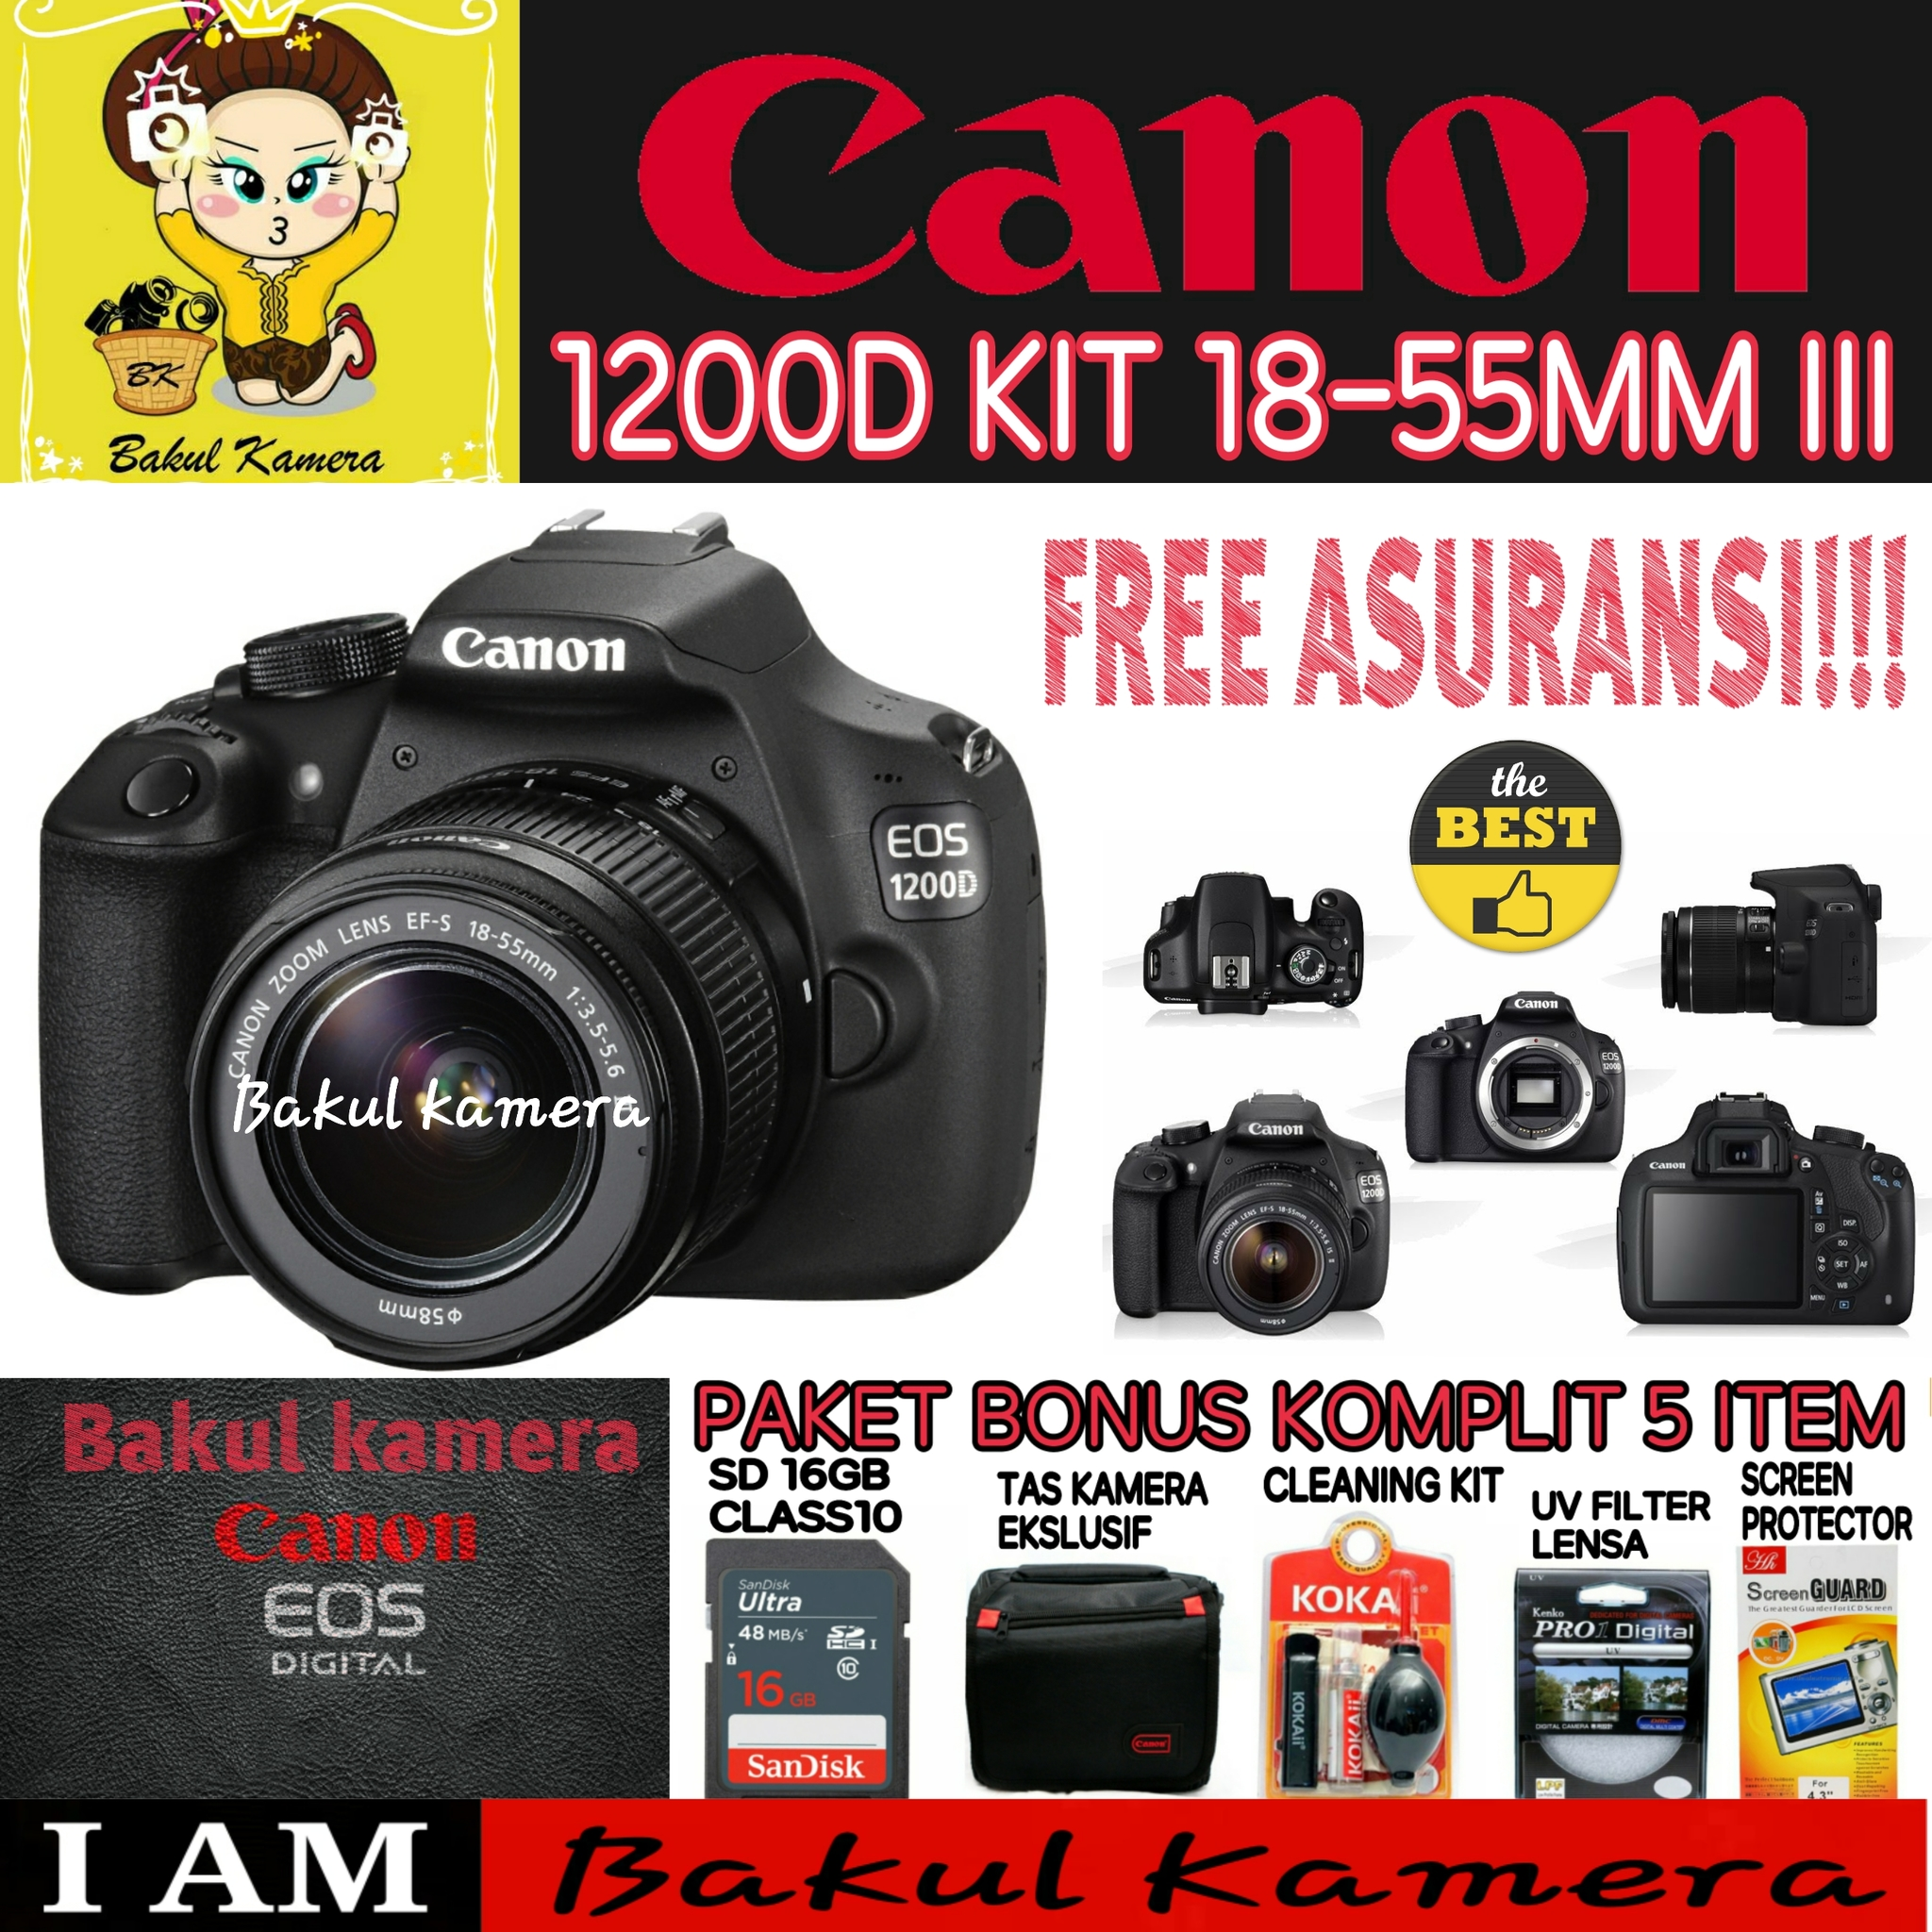 Jual Canon Eos 1200d Kit 18 55mm Iii Lensa Kamera Bakul Tokopedia